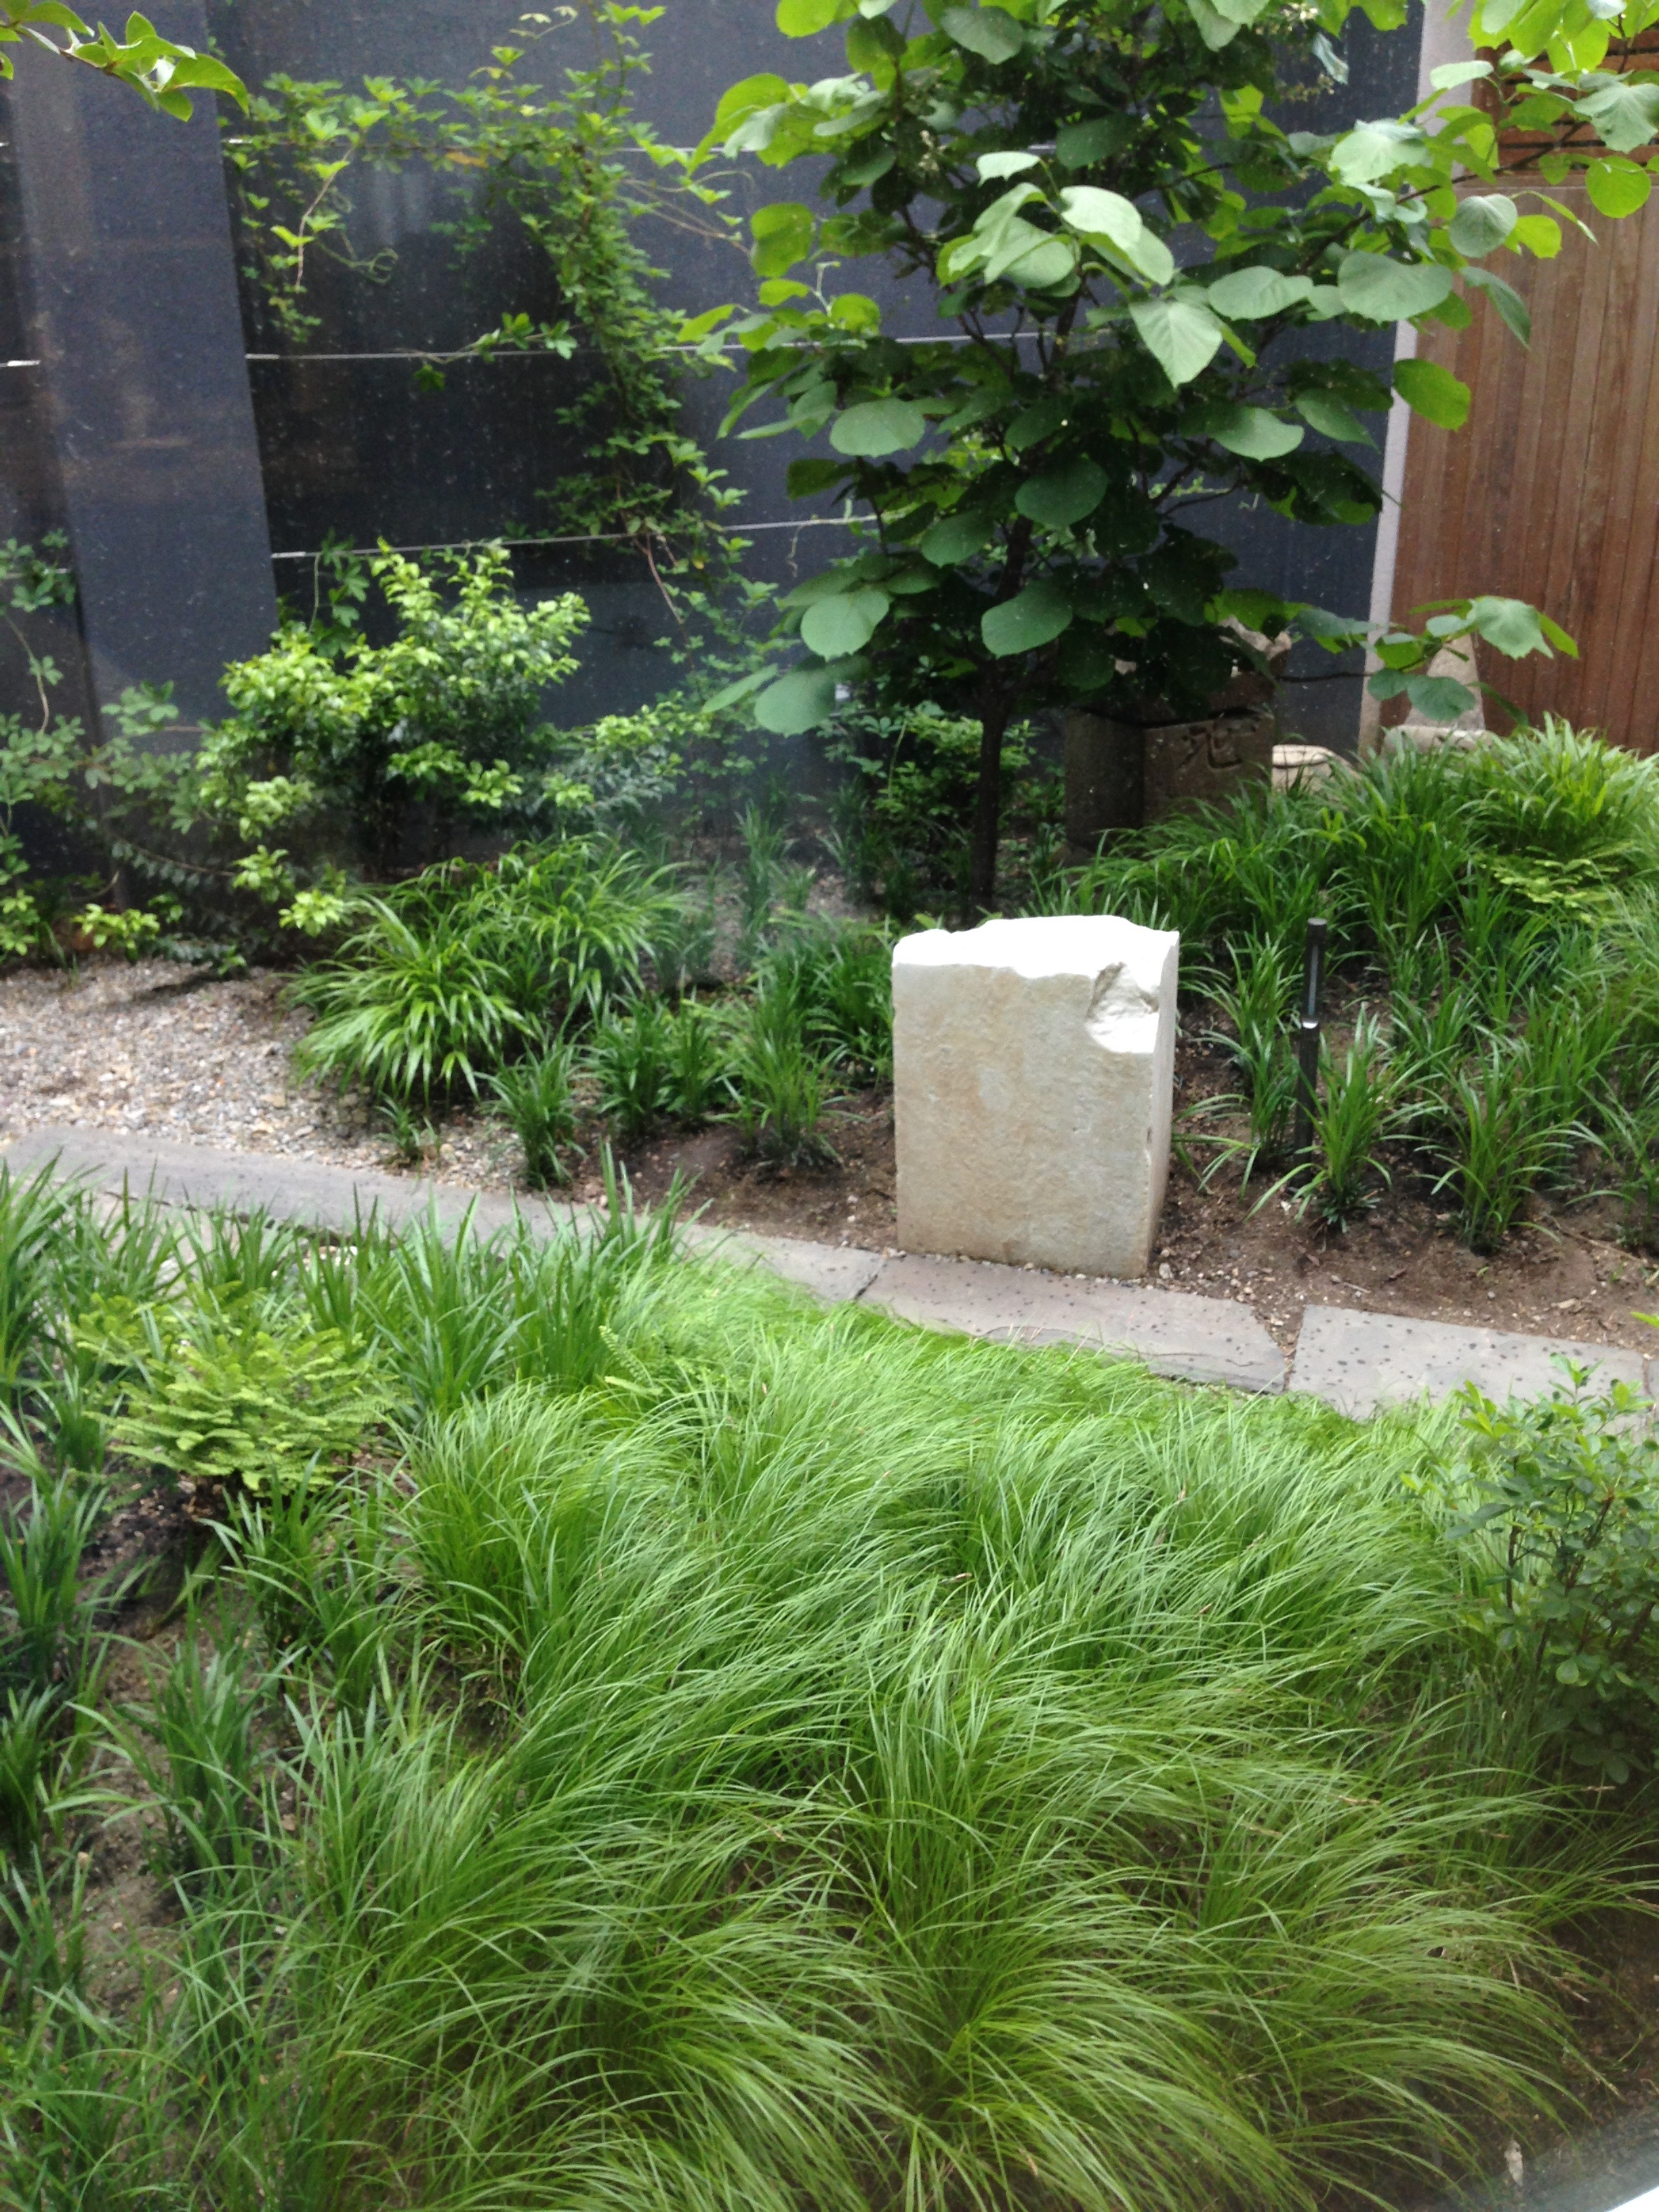 VERDANT,+Stone+Garden,+Mac+Carbonell+designer,+Contemporary+landscape,+New+York+landscape+design.jpg